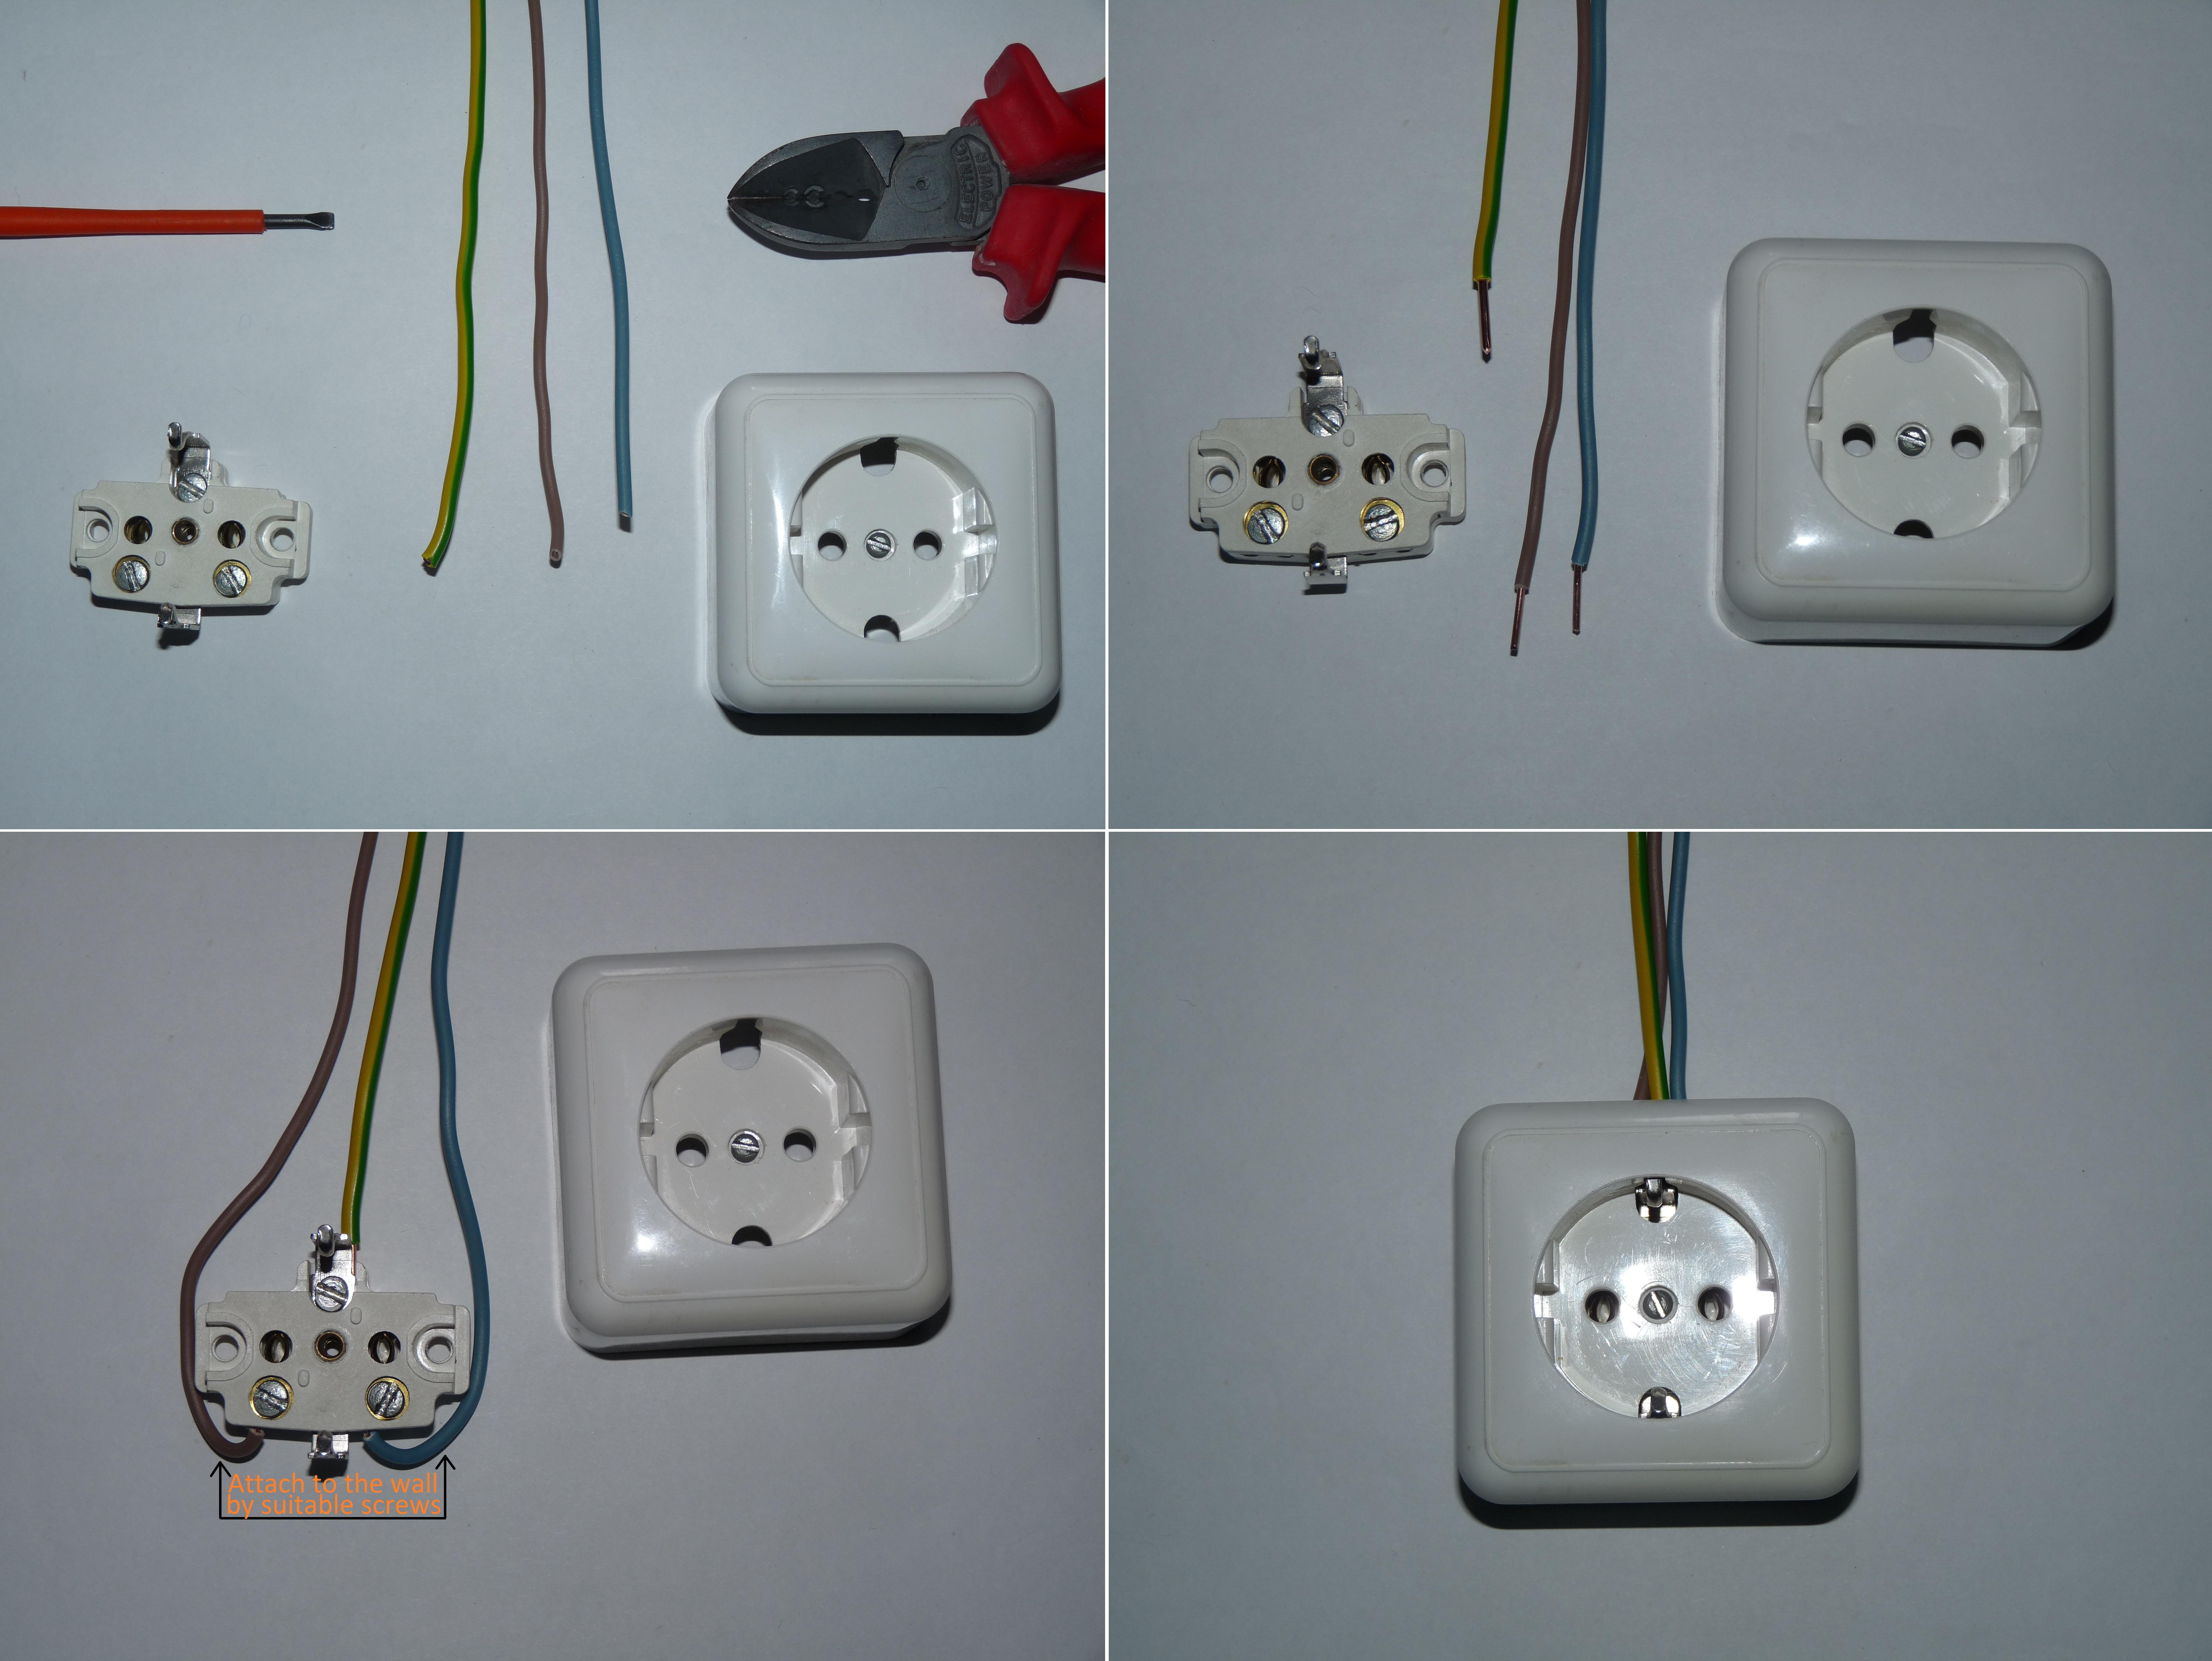 DO_8645] Schuko Socket Wiring Diagram Wiring DiagramXaem Vell Gritea Mohammedshrine Librar Wiring 101